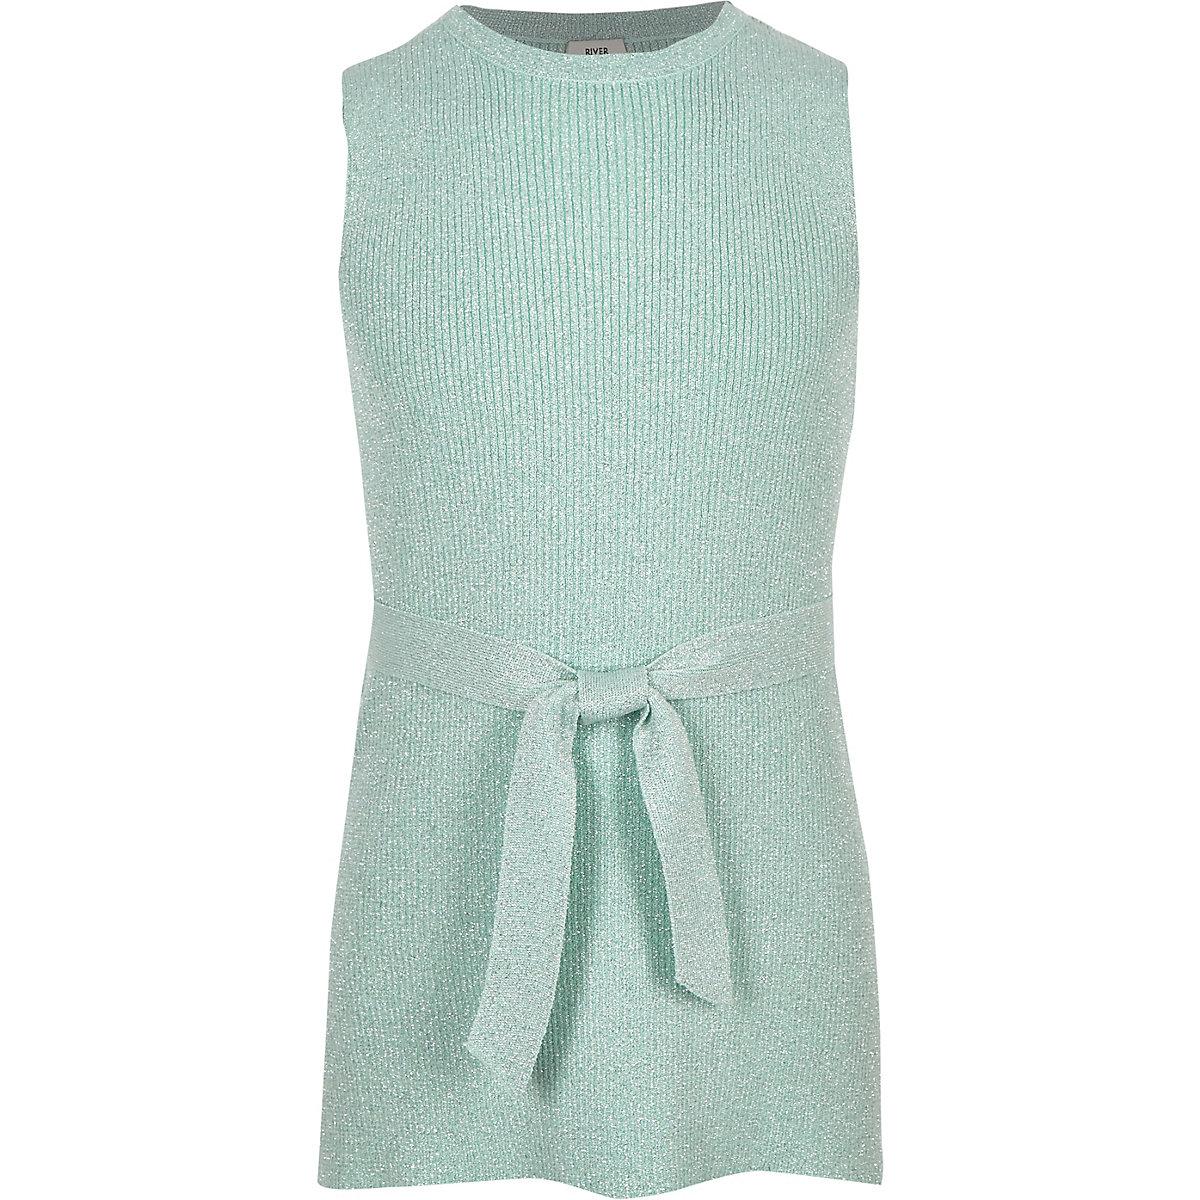 Girls green metallic tie waist tunic top